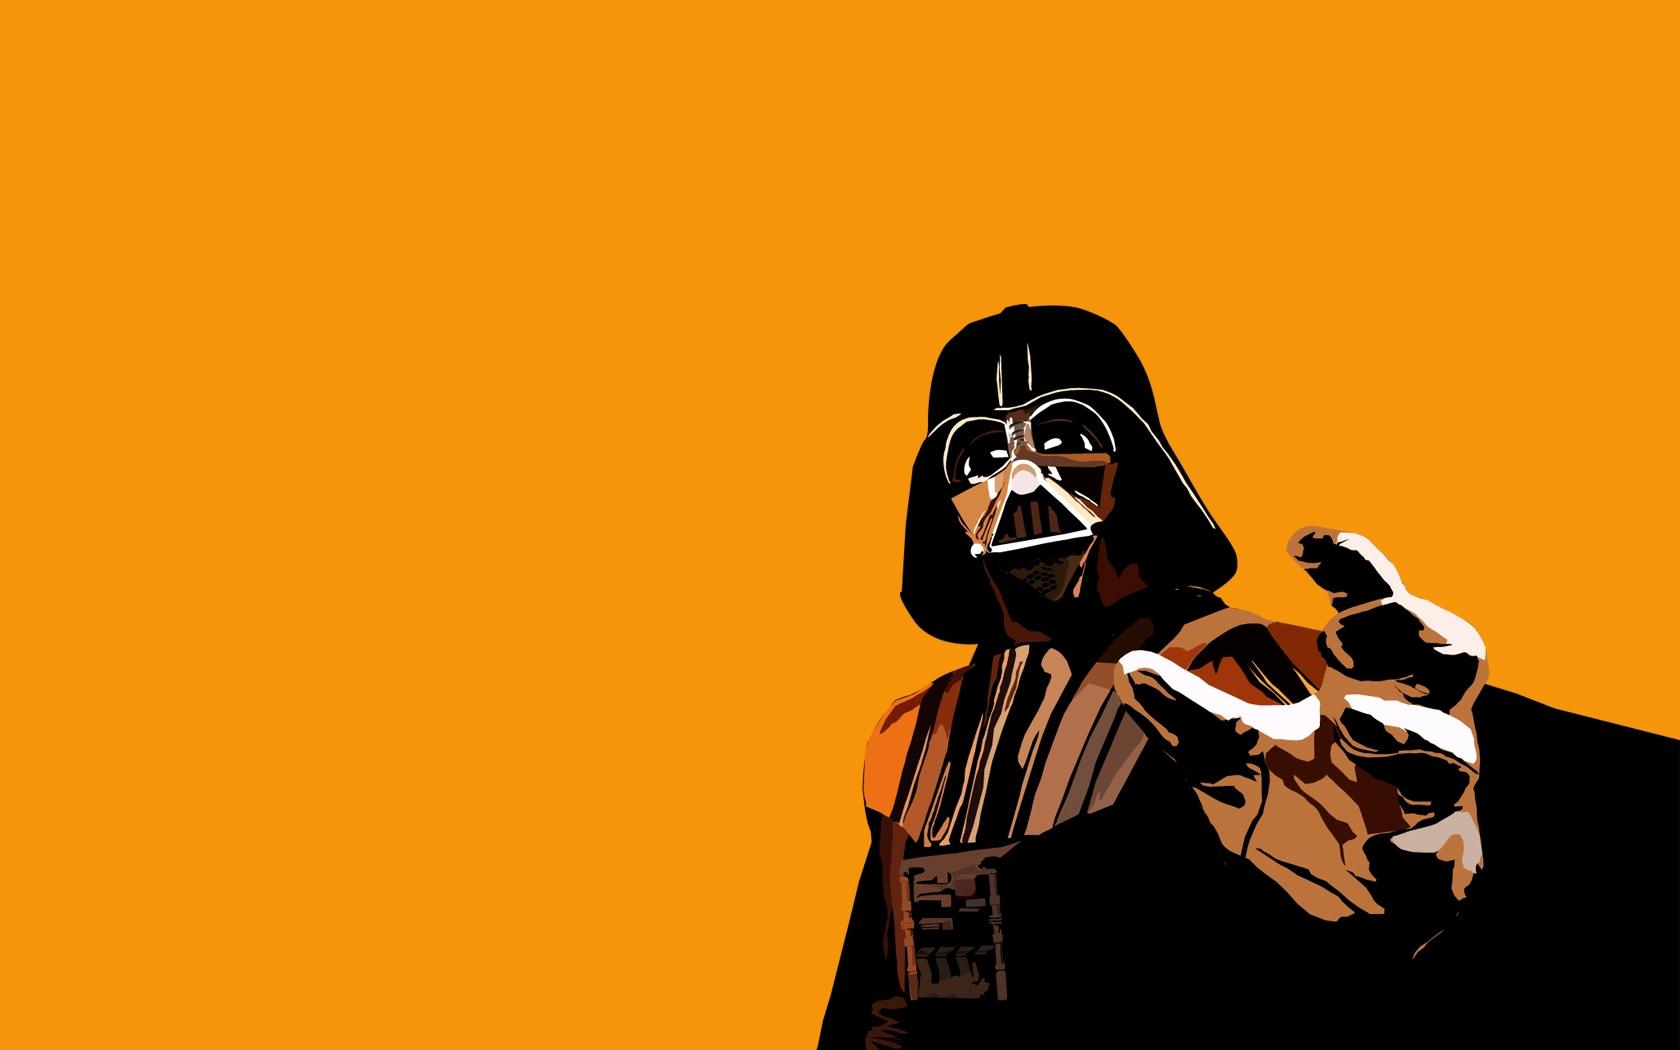 Wallpaper Darth Vader Hand Mask Cape 1680x1050